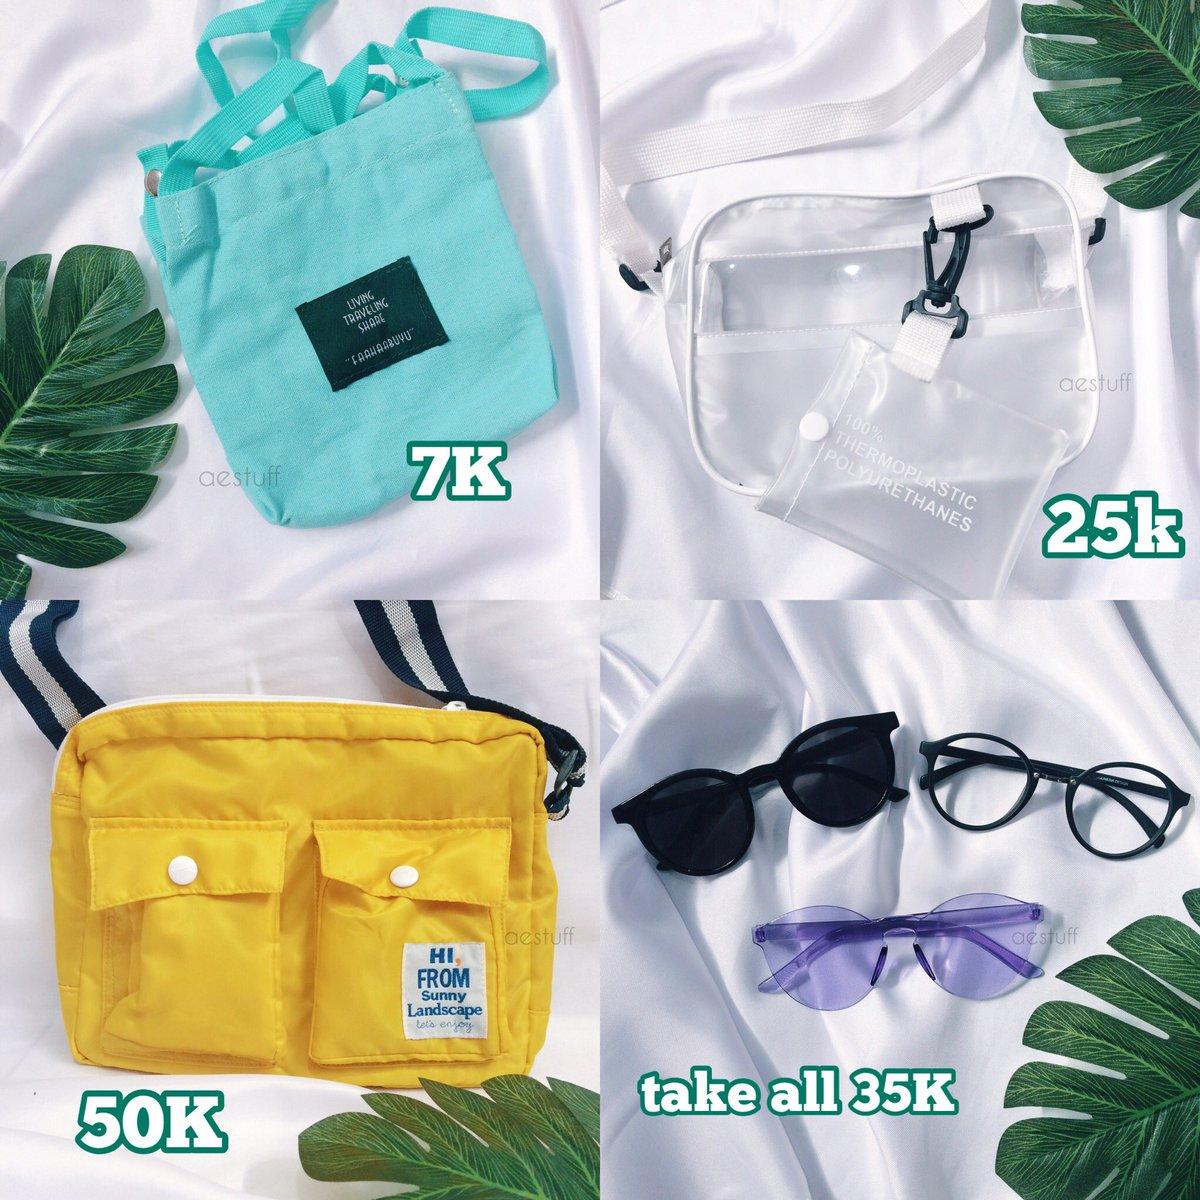 new: - slingbag tosca - slingbag transparant - kacamata ungu sisa nya preloved, angkut yuk bisa free ong shopee pic.twitter.com/SgZF9uUYIn